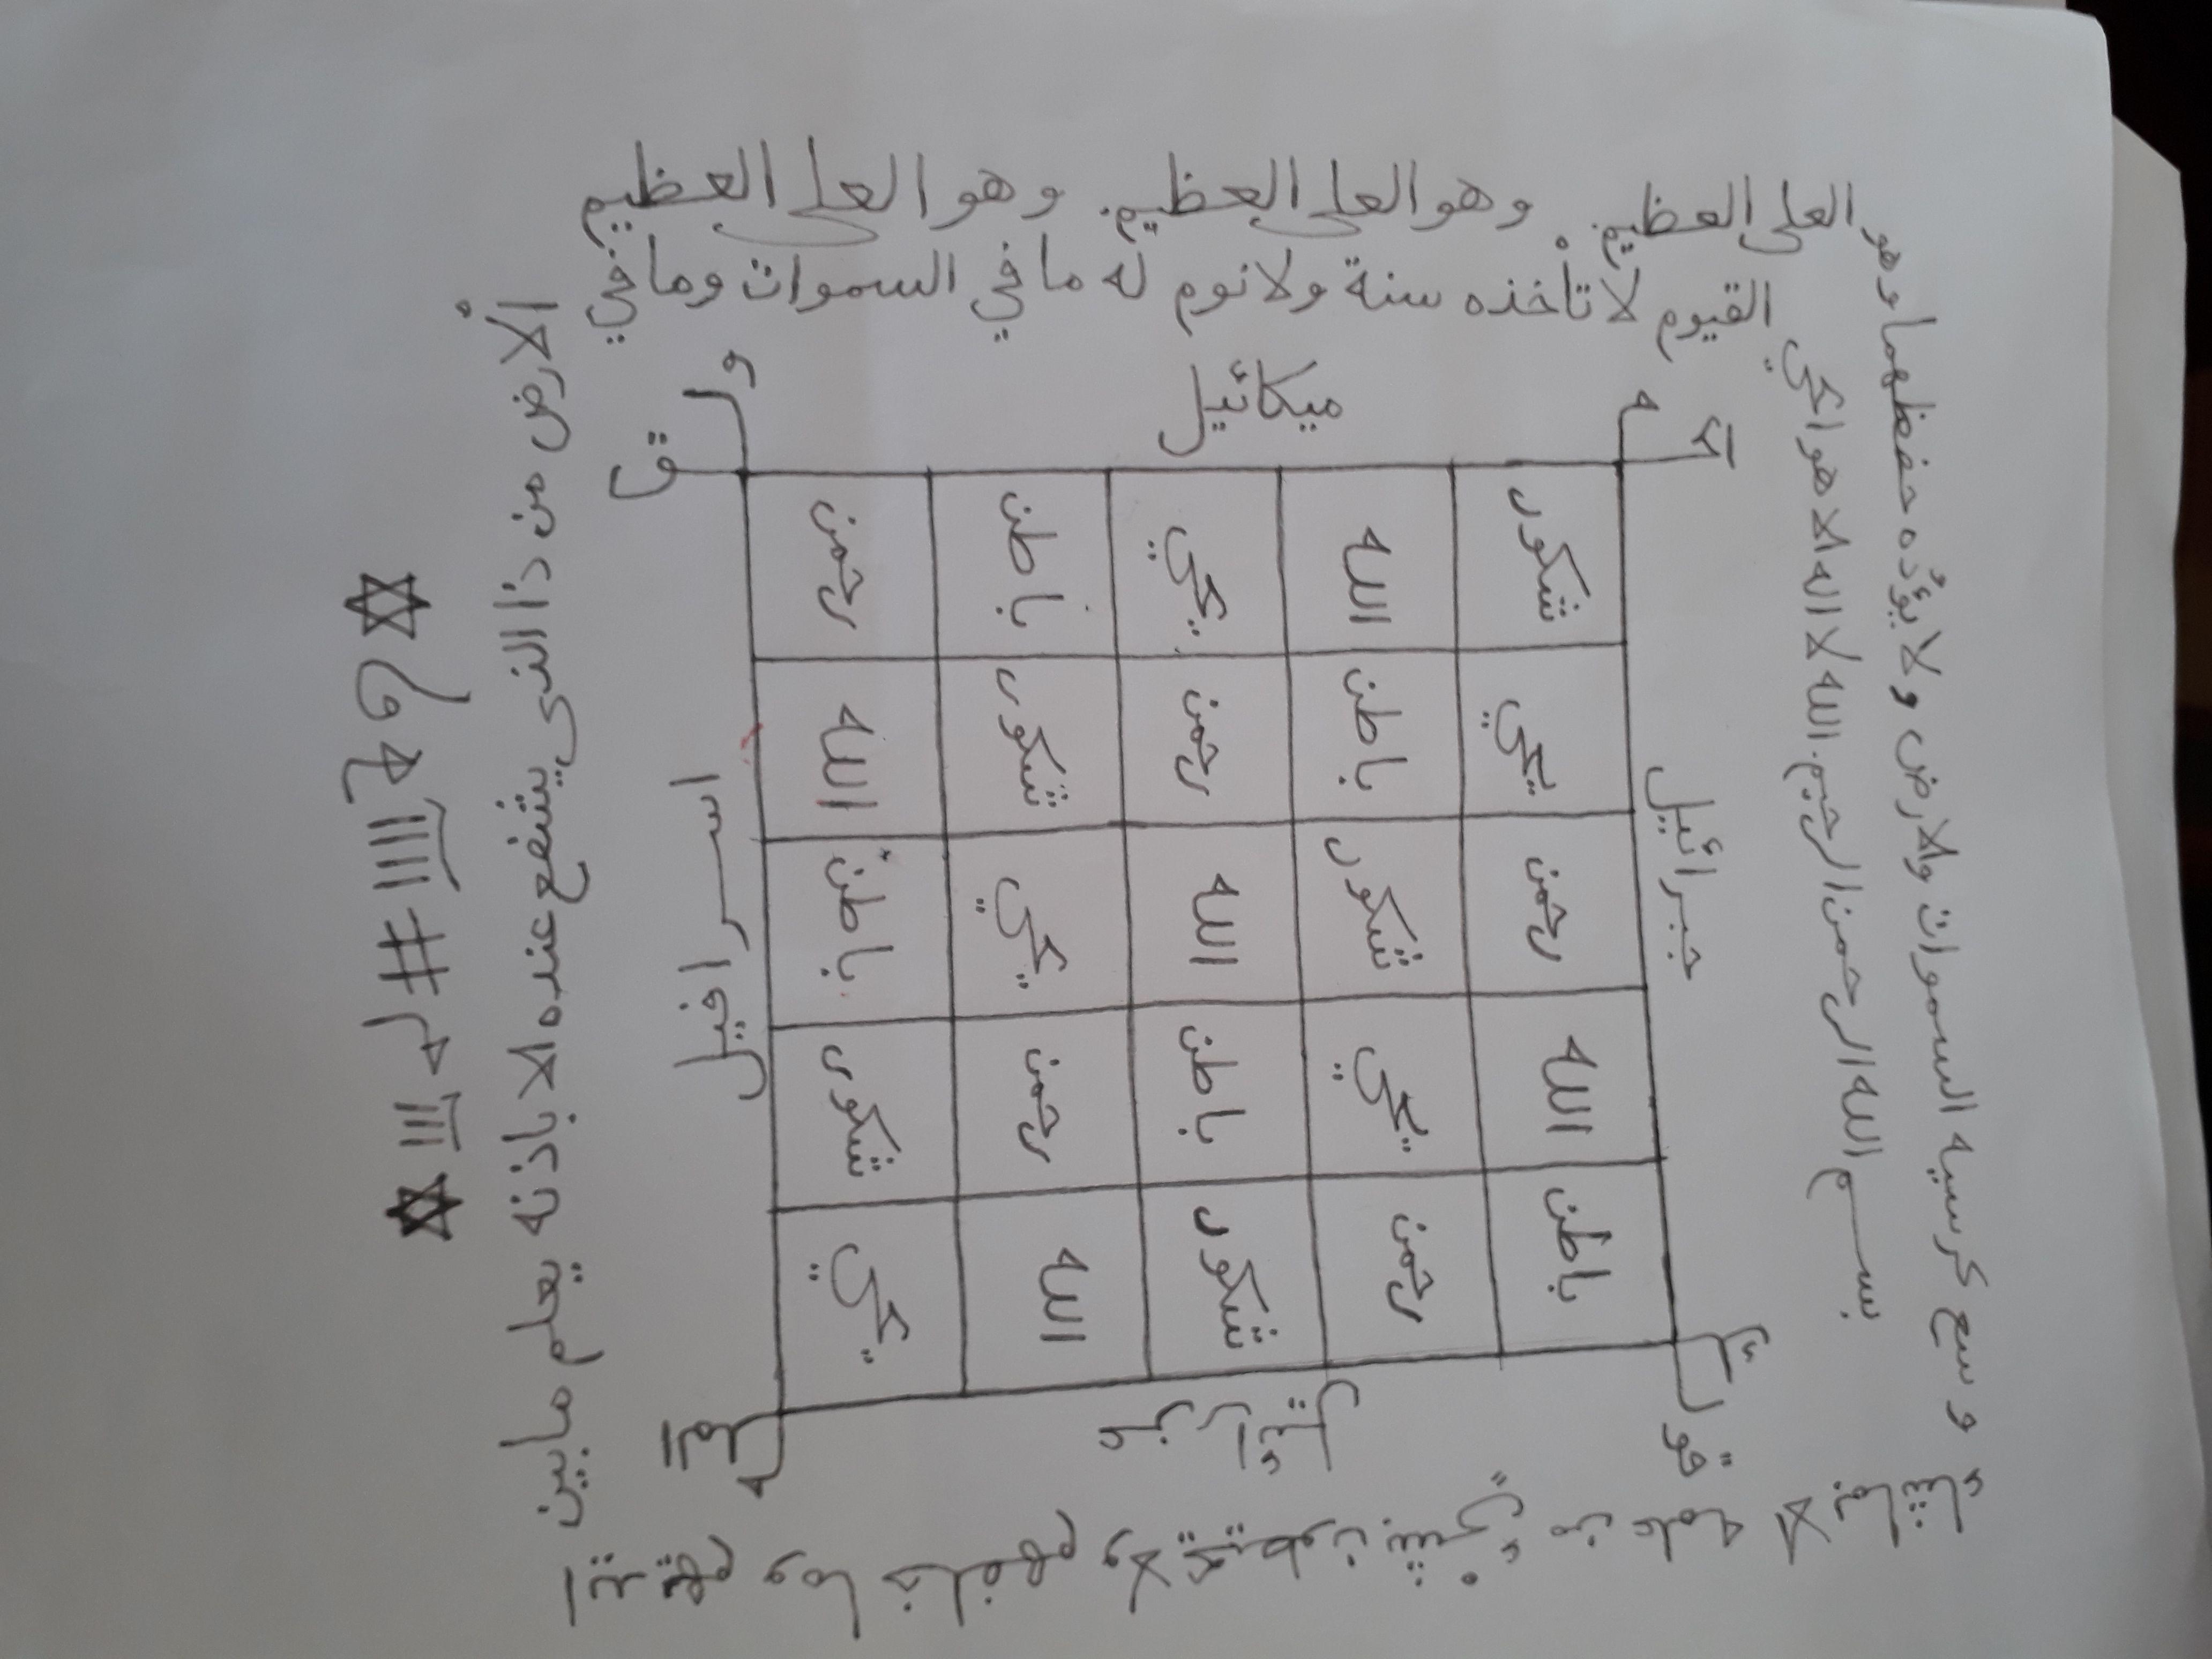 فك النحس لامثيل له بالقوة Arabic Books Pdf Books Download Free Ebooks Download Books